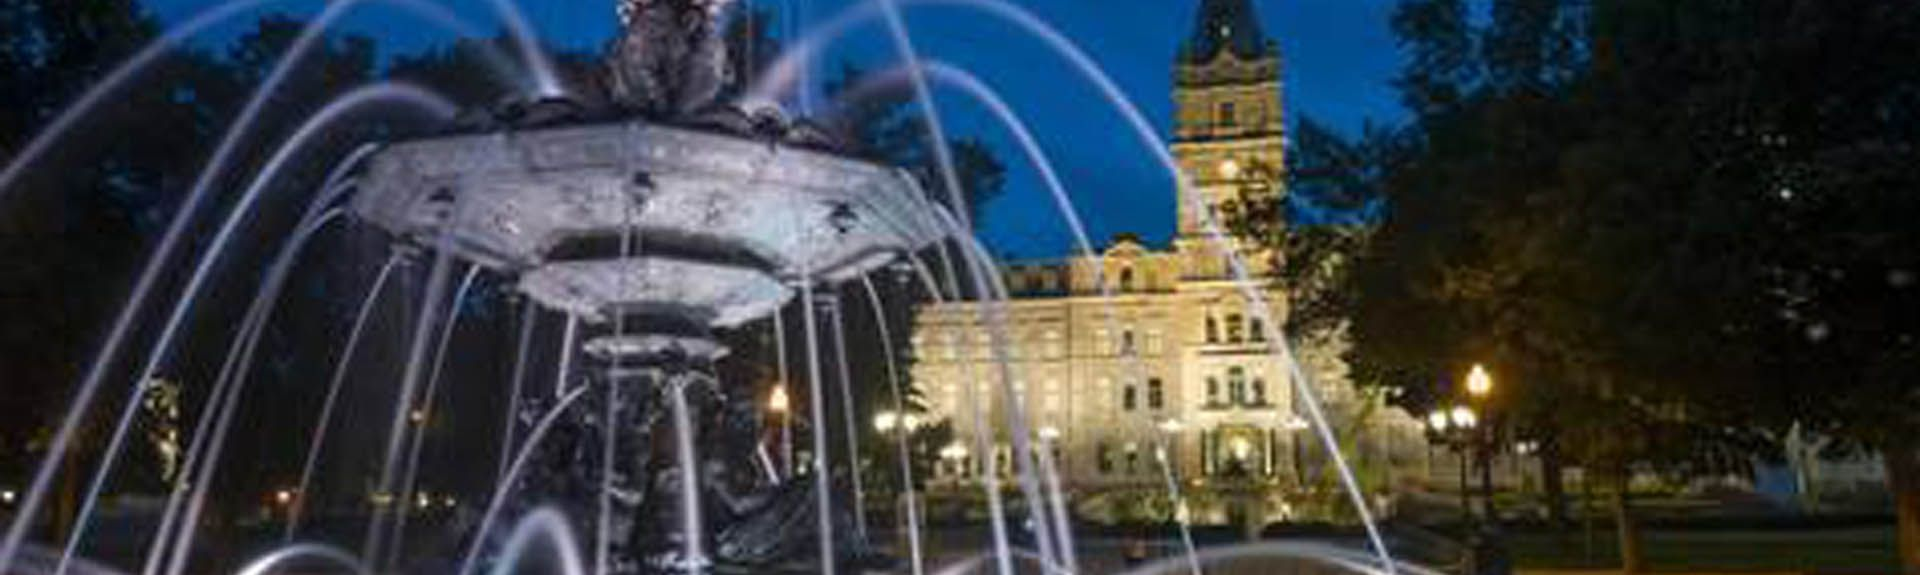 Quebec Gamle Kabelbane, Québec, Québec, Canada